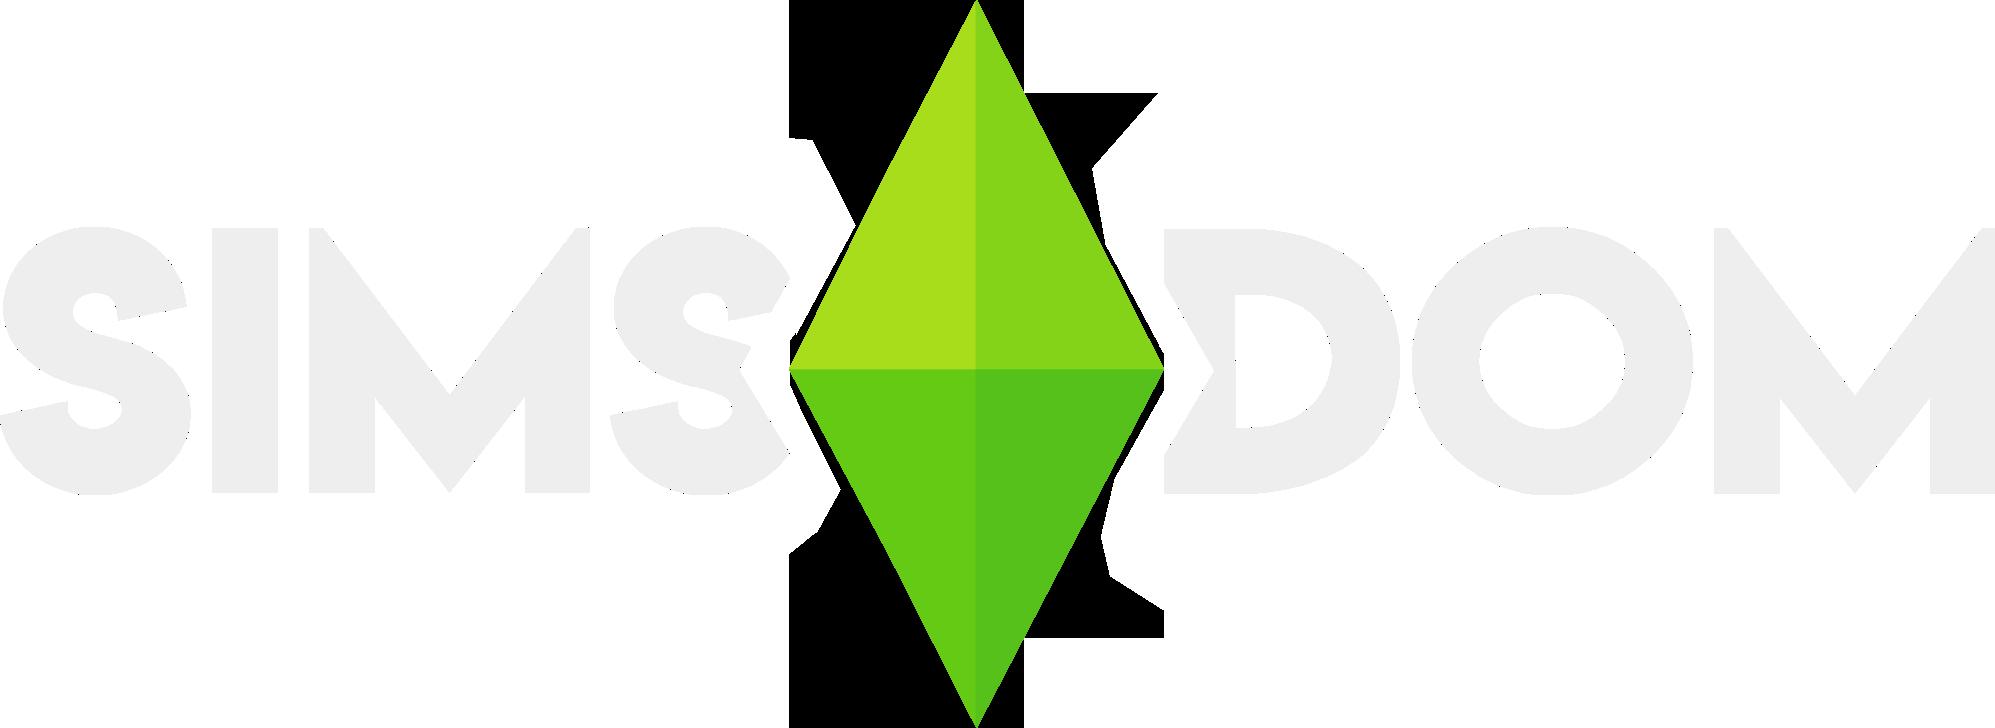 Ts4 Logo Plumbob Jpg Png Sims Sims 4 Vaporwave